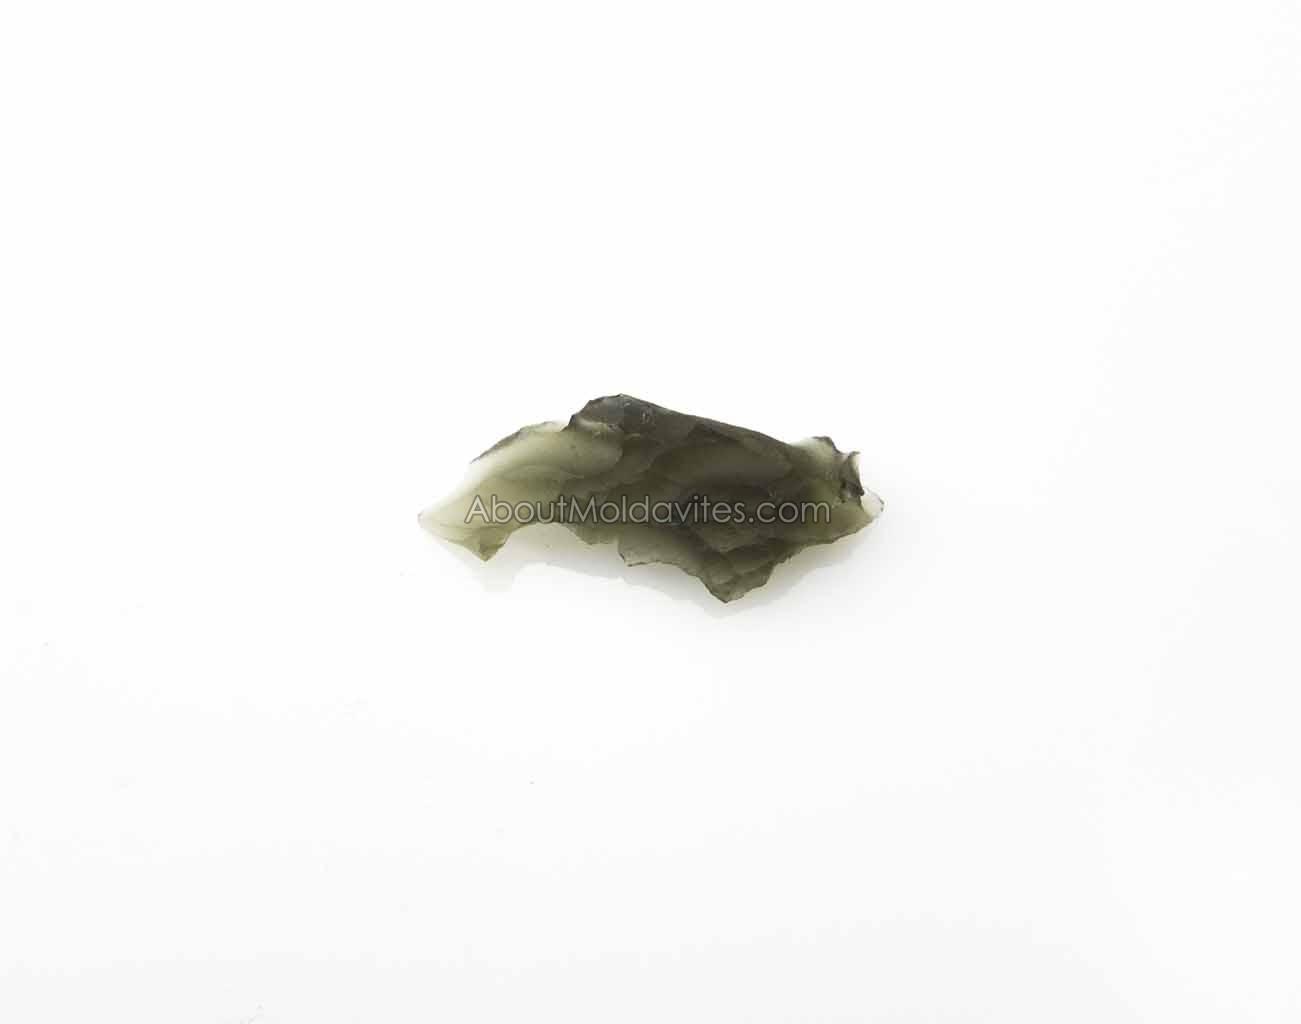 Moldavite from deposit Chelcice